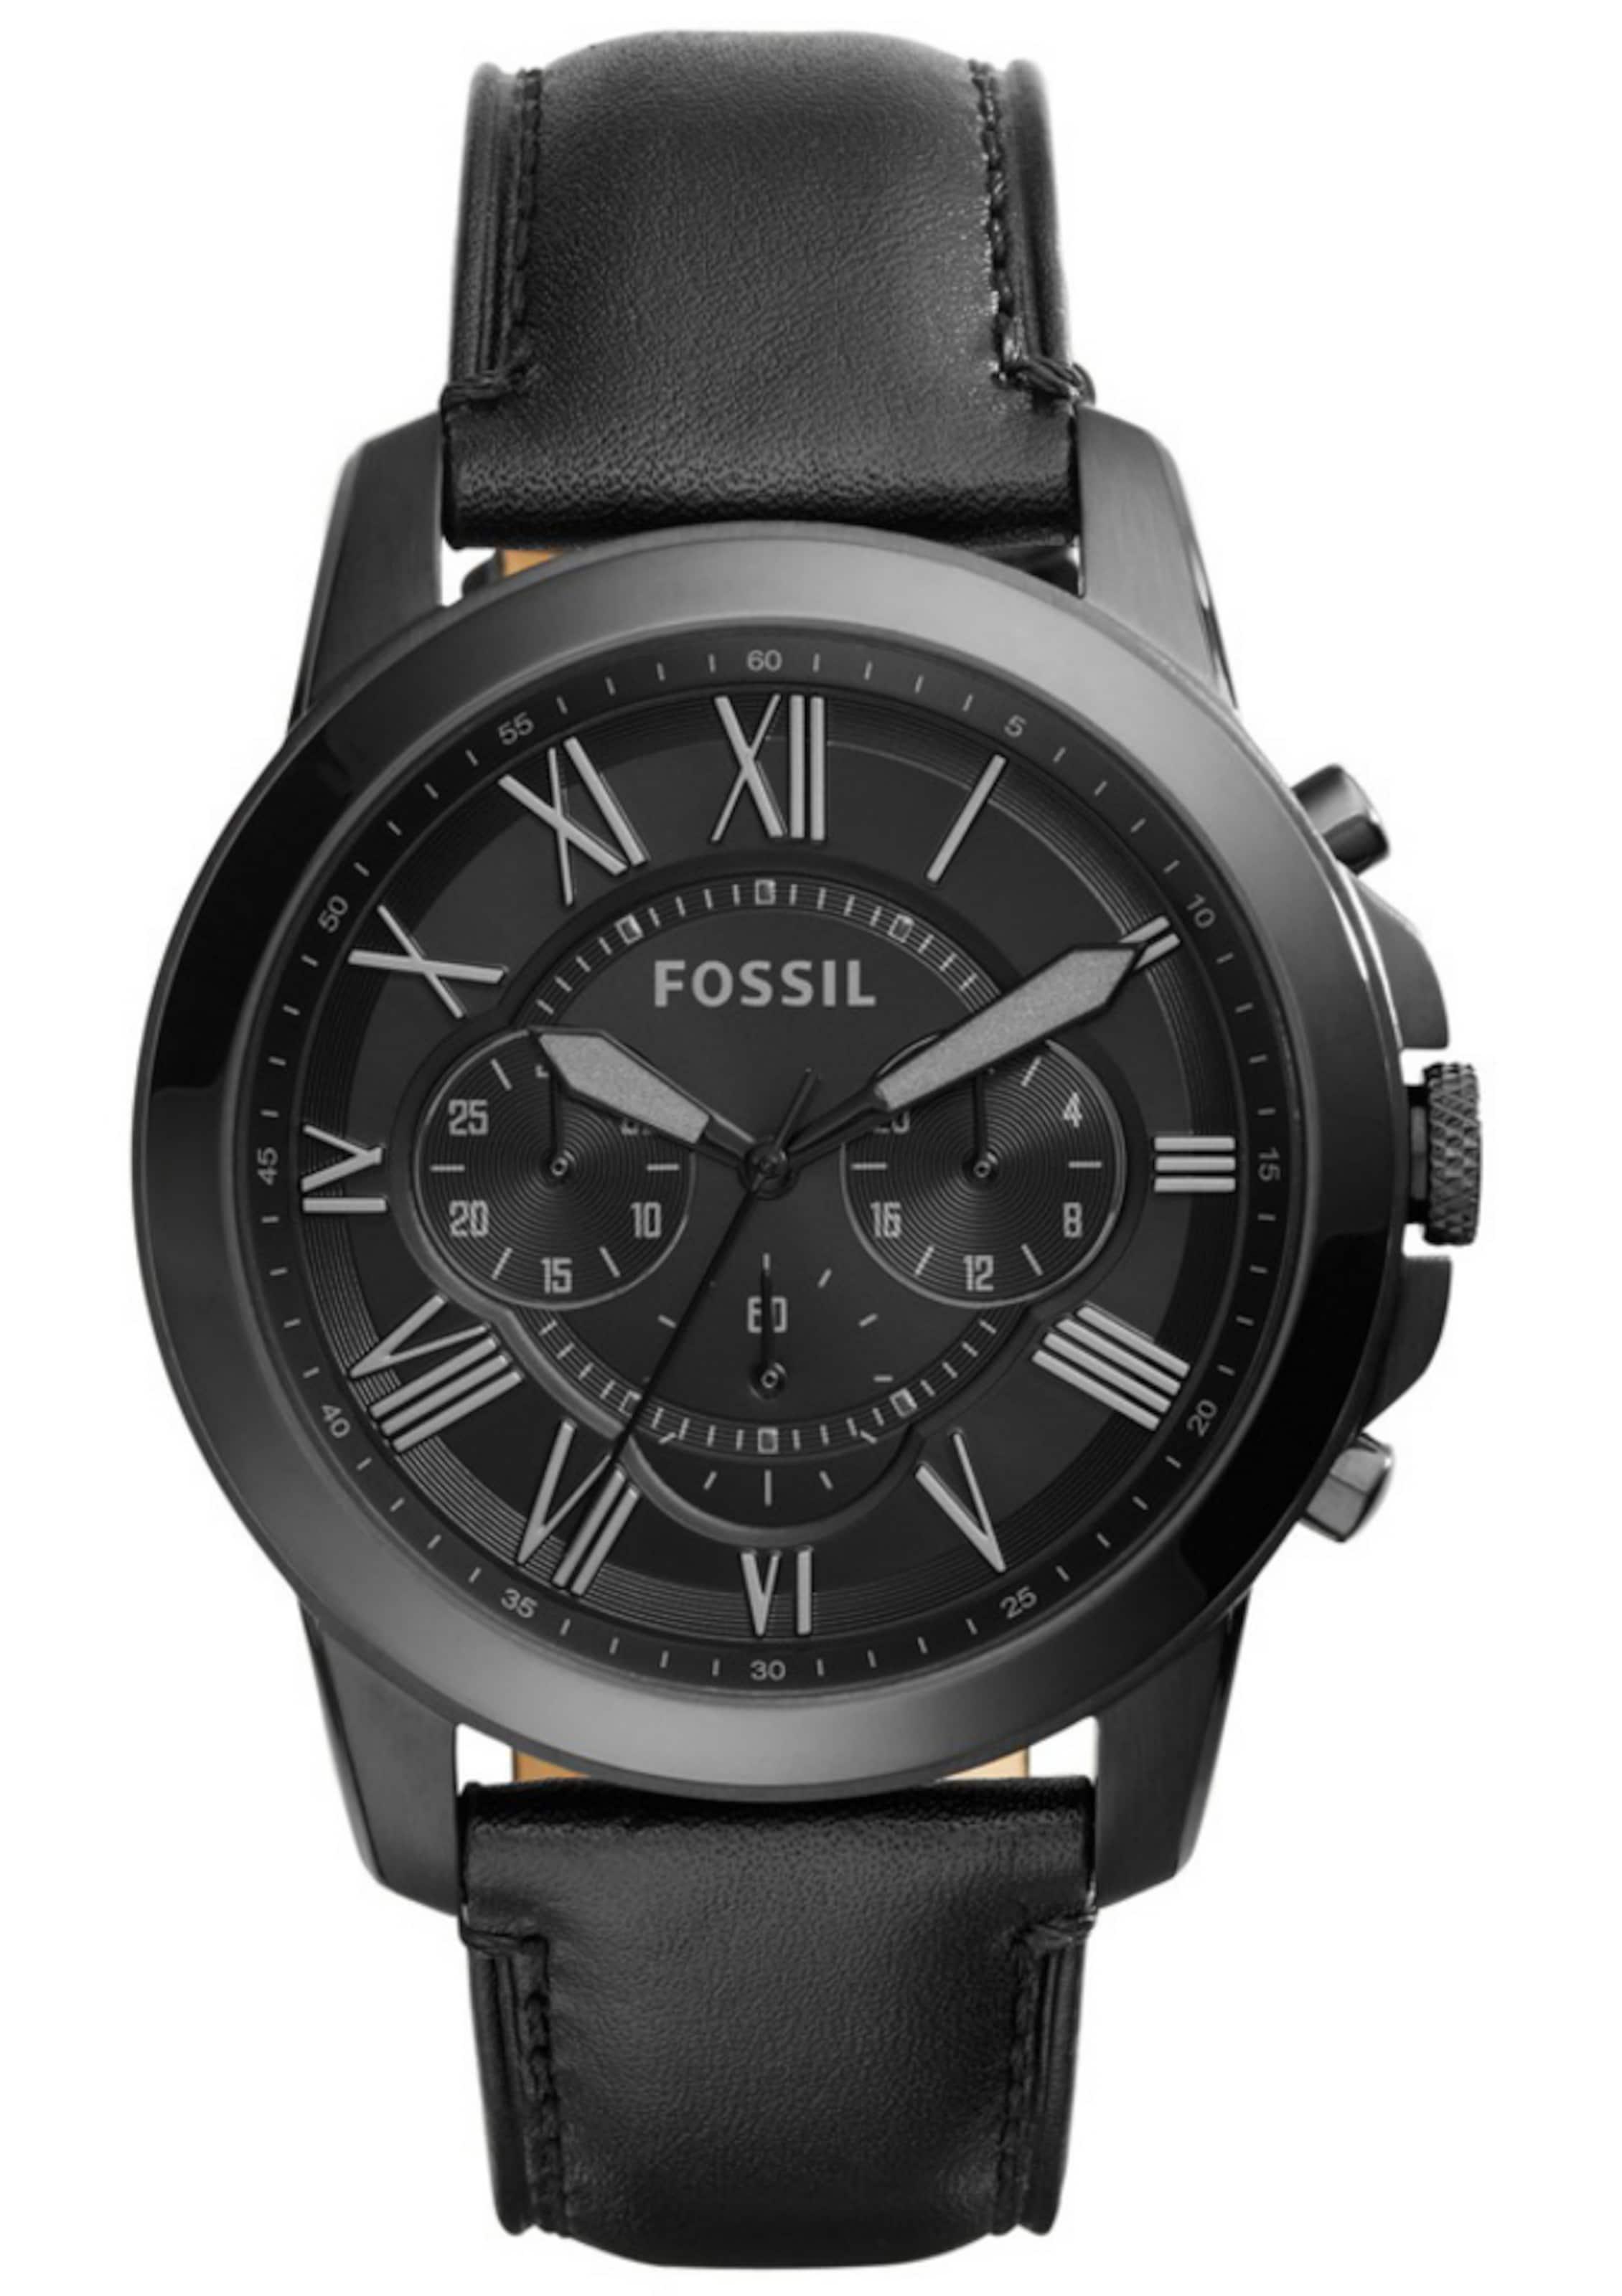 FOSSIL Chronograph »Grant« Billig Verkauf Geschäft mQLevM1D